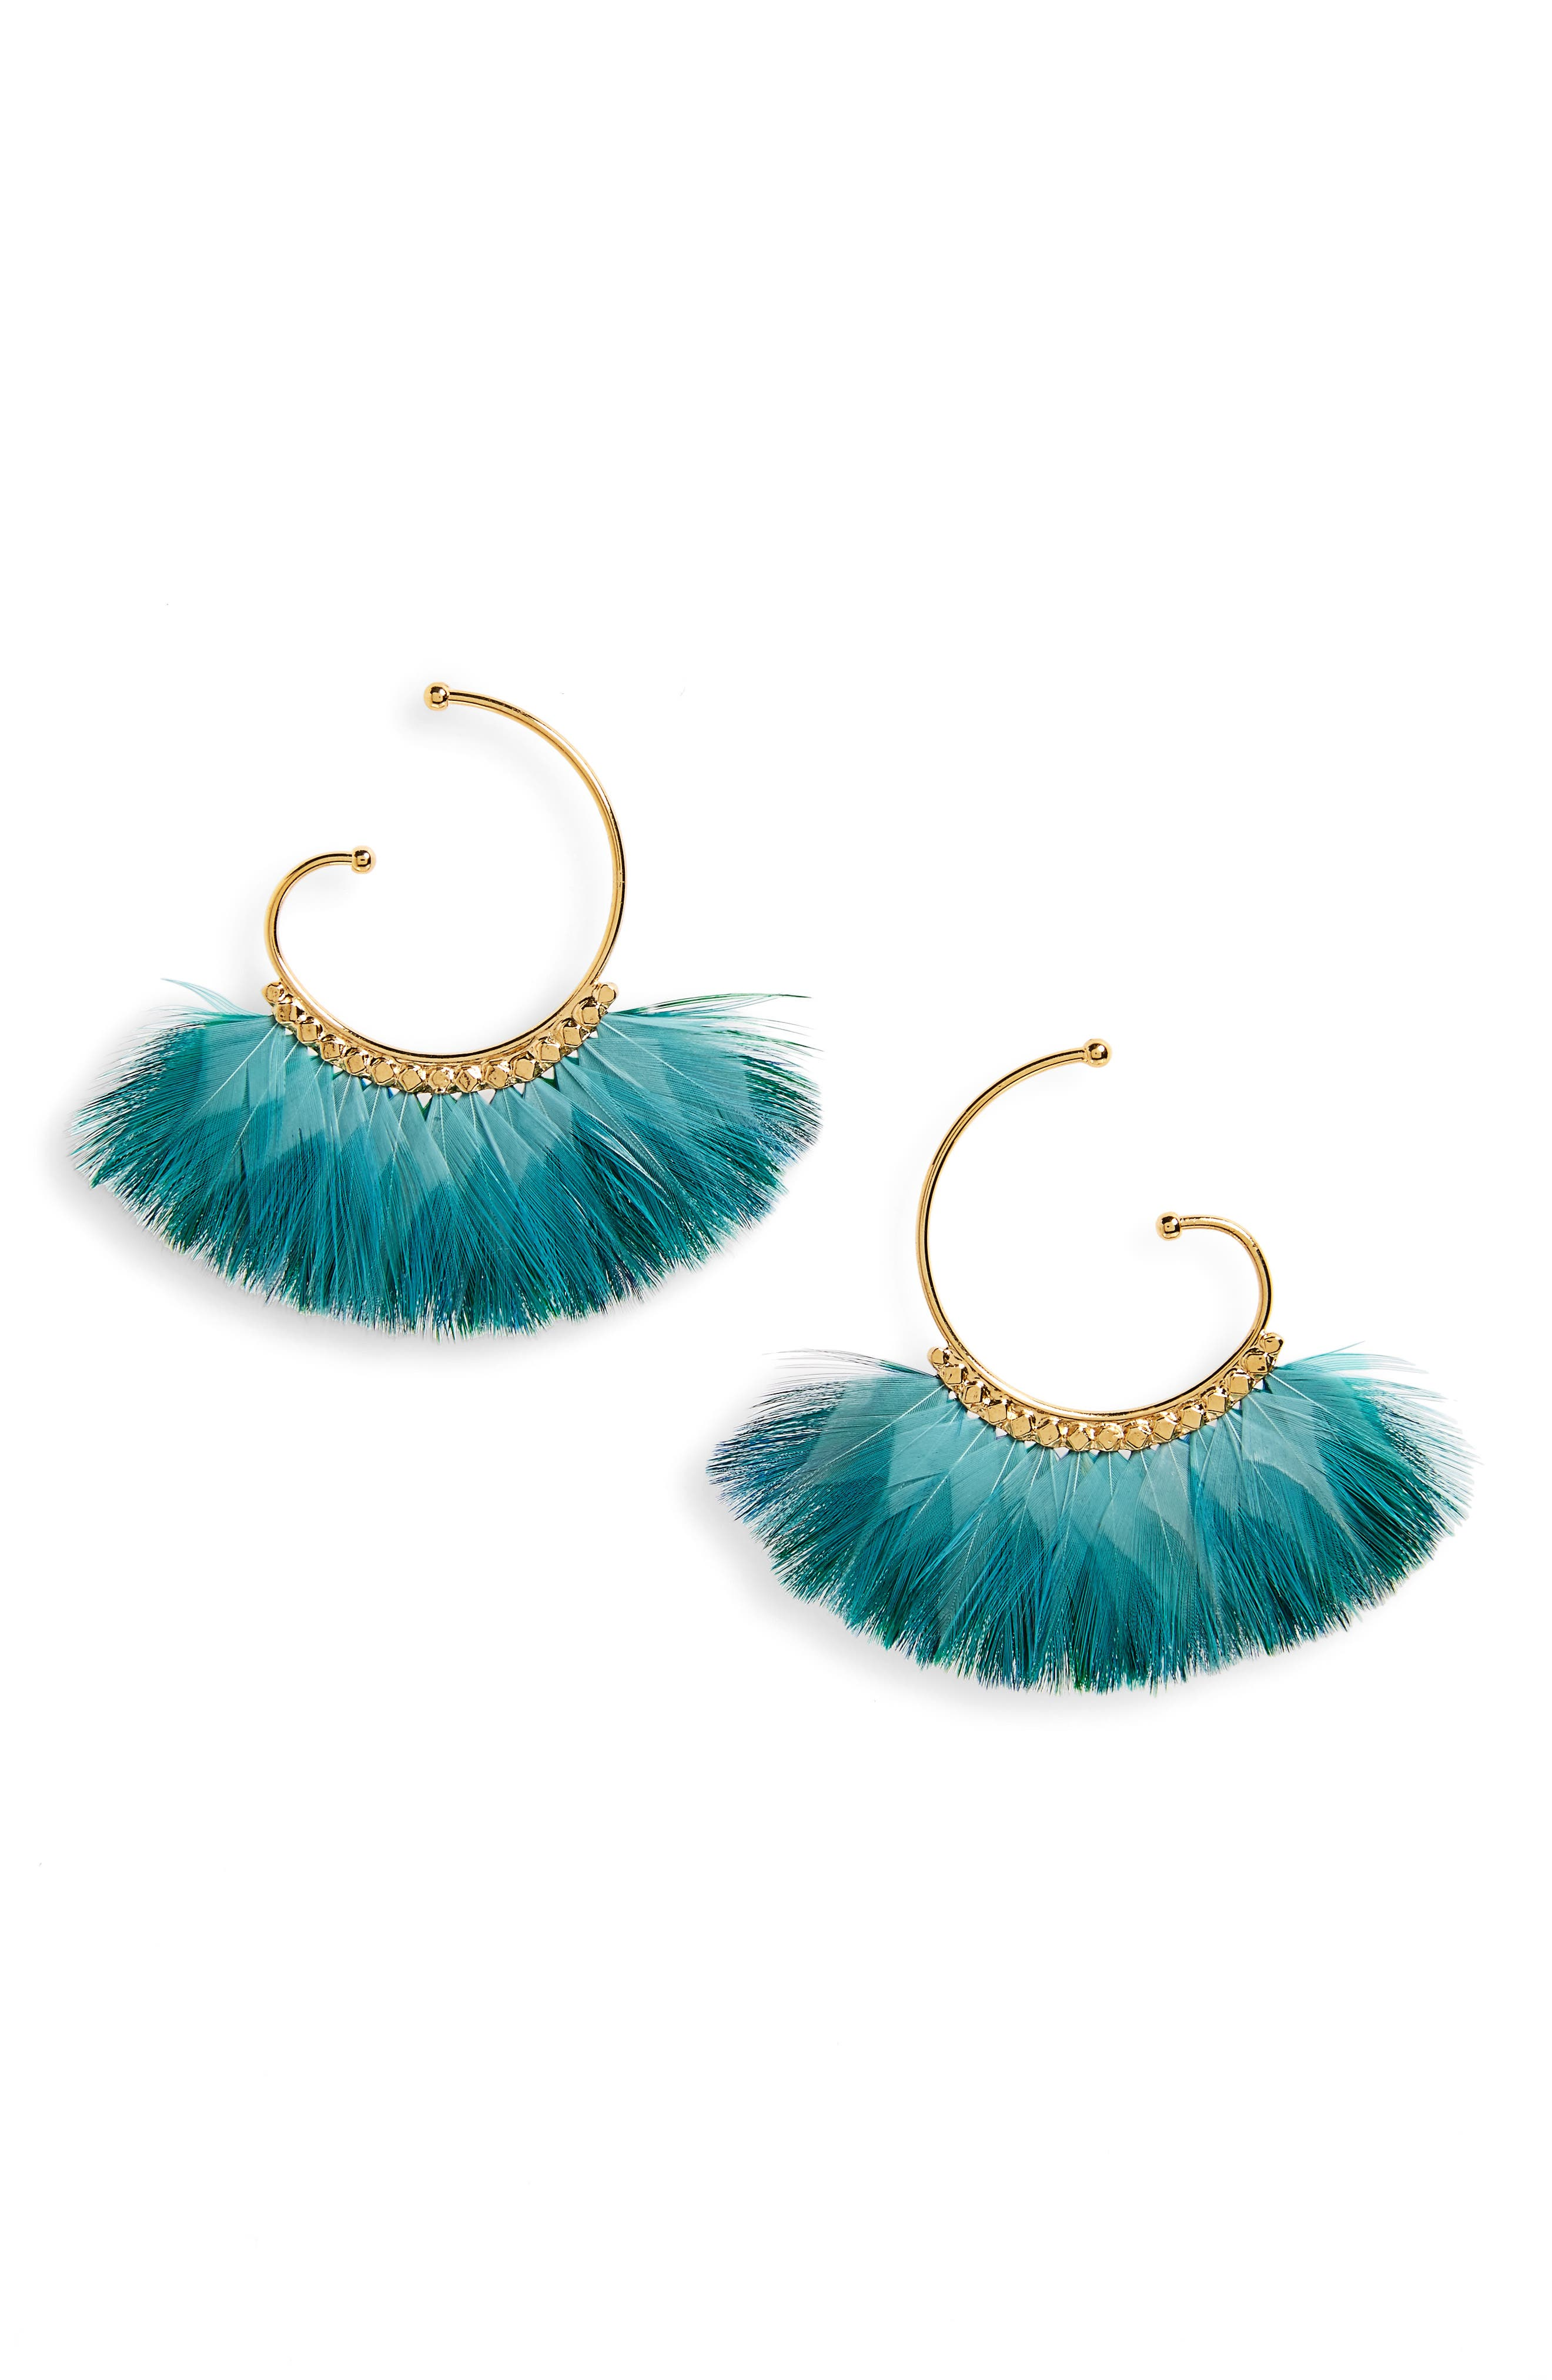 Main Image - Gas Bijoux 'Buzios' Feather Earrings